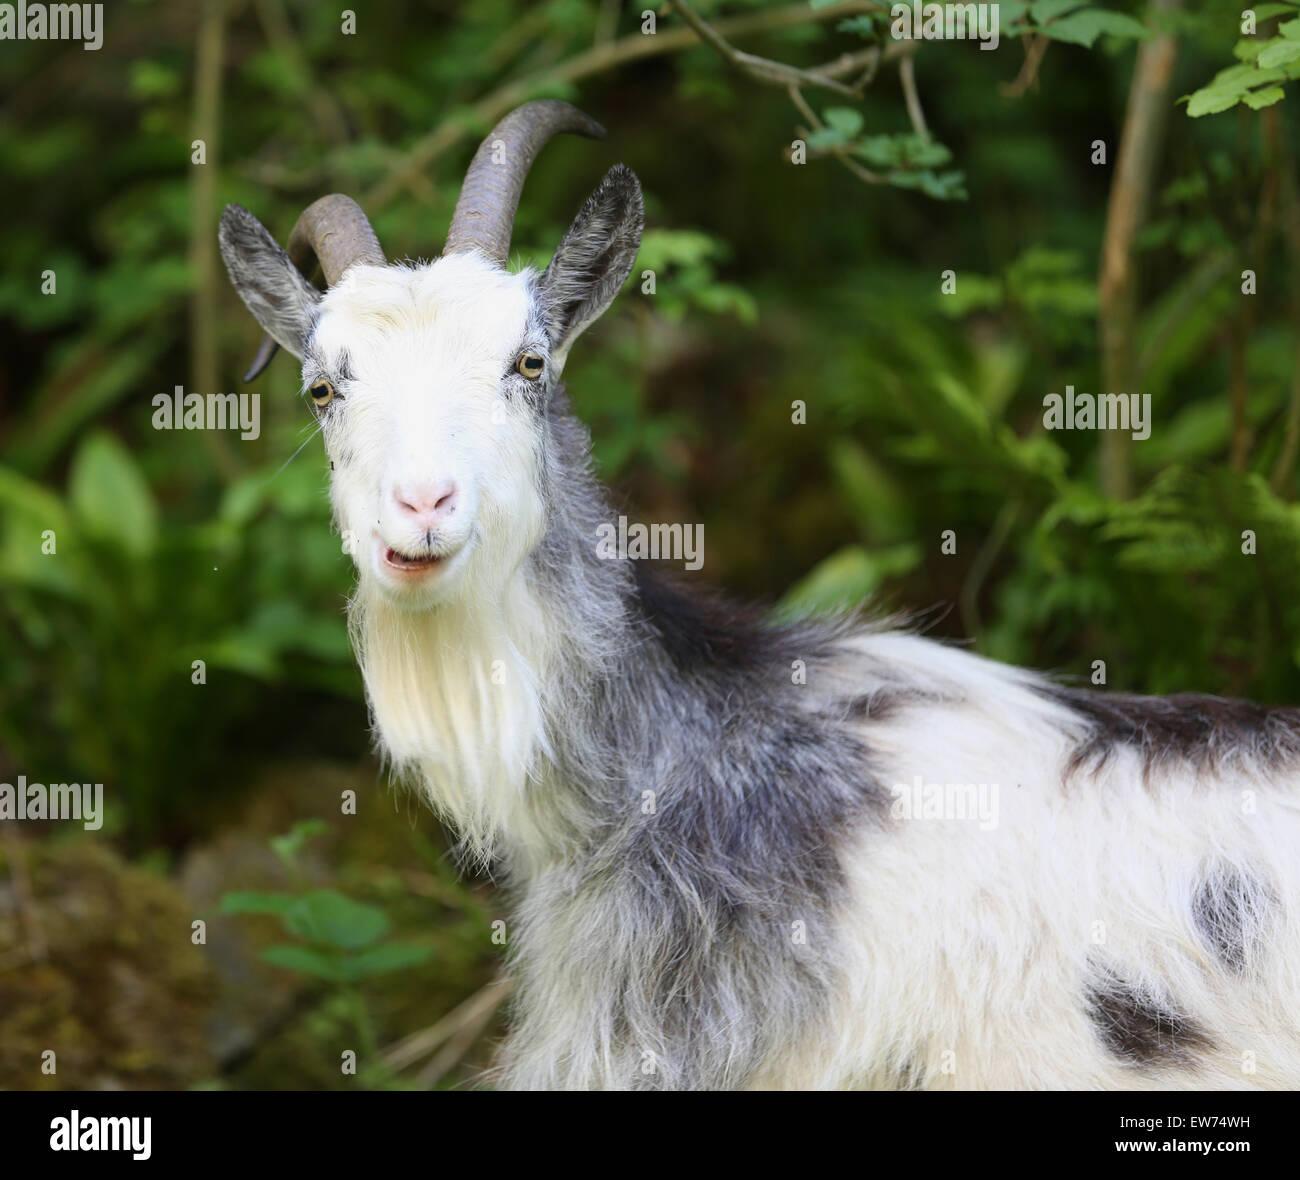 Feral nanny goat in Cheddar gorge, - Stock Image